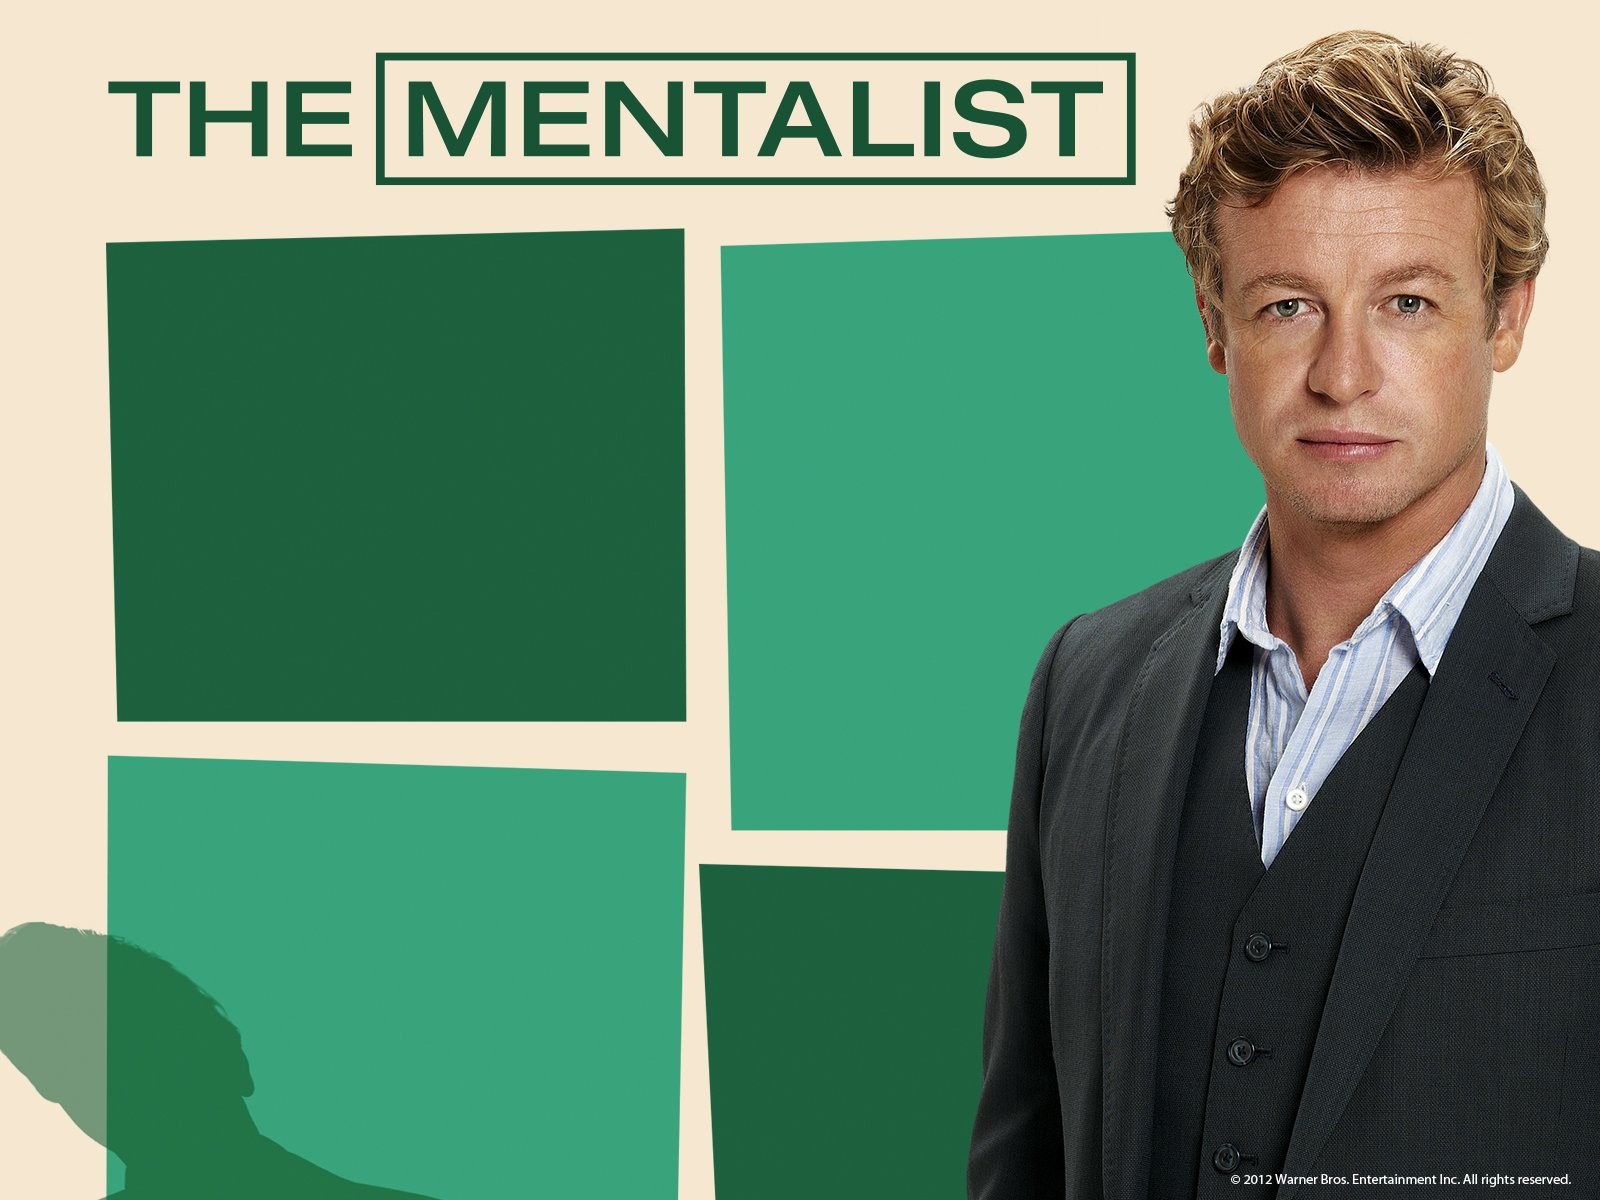 the mentalist season 5 episode 3 subtitles